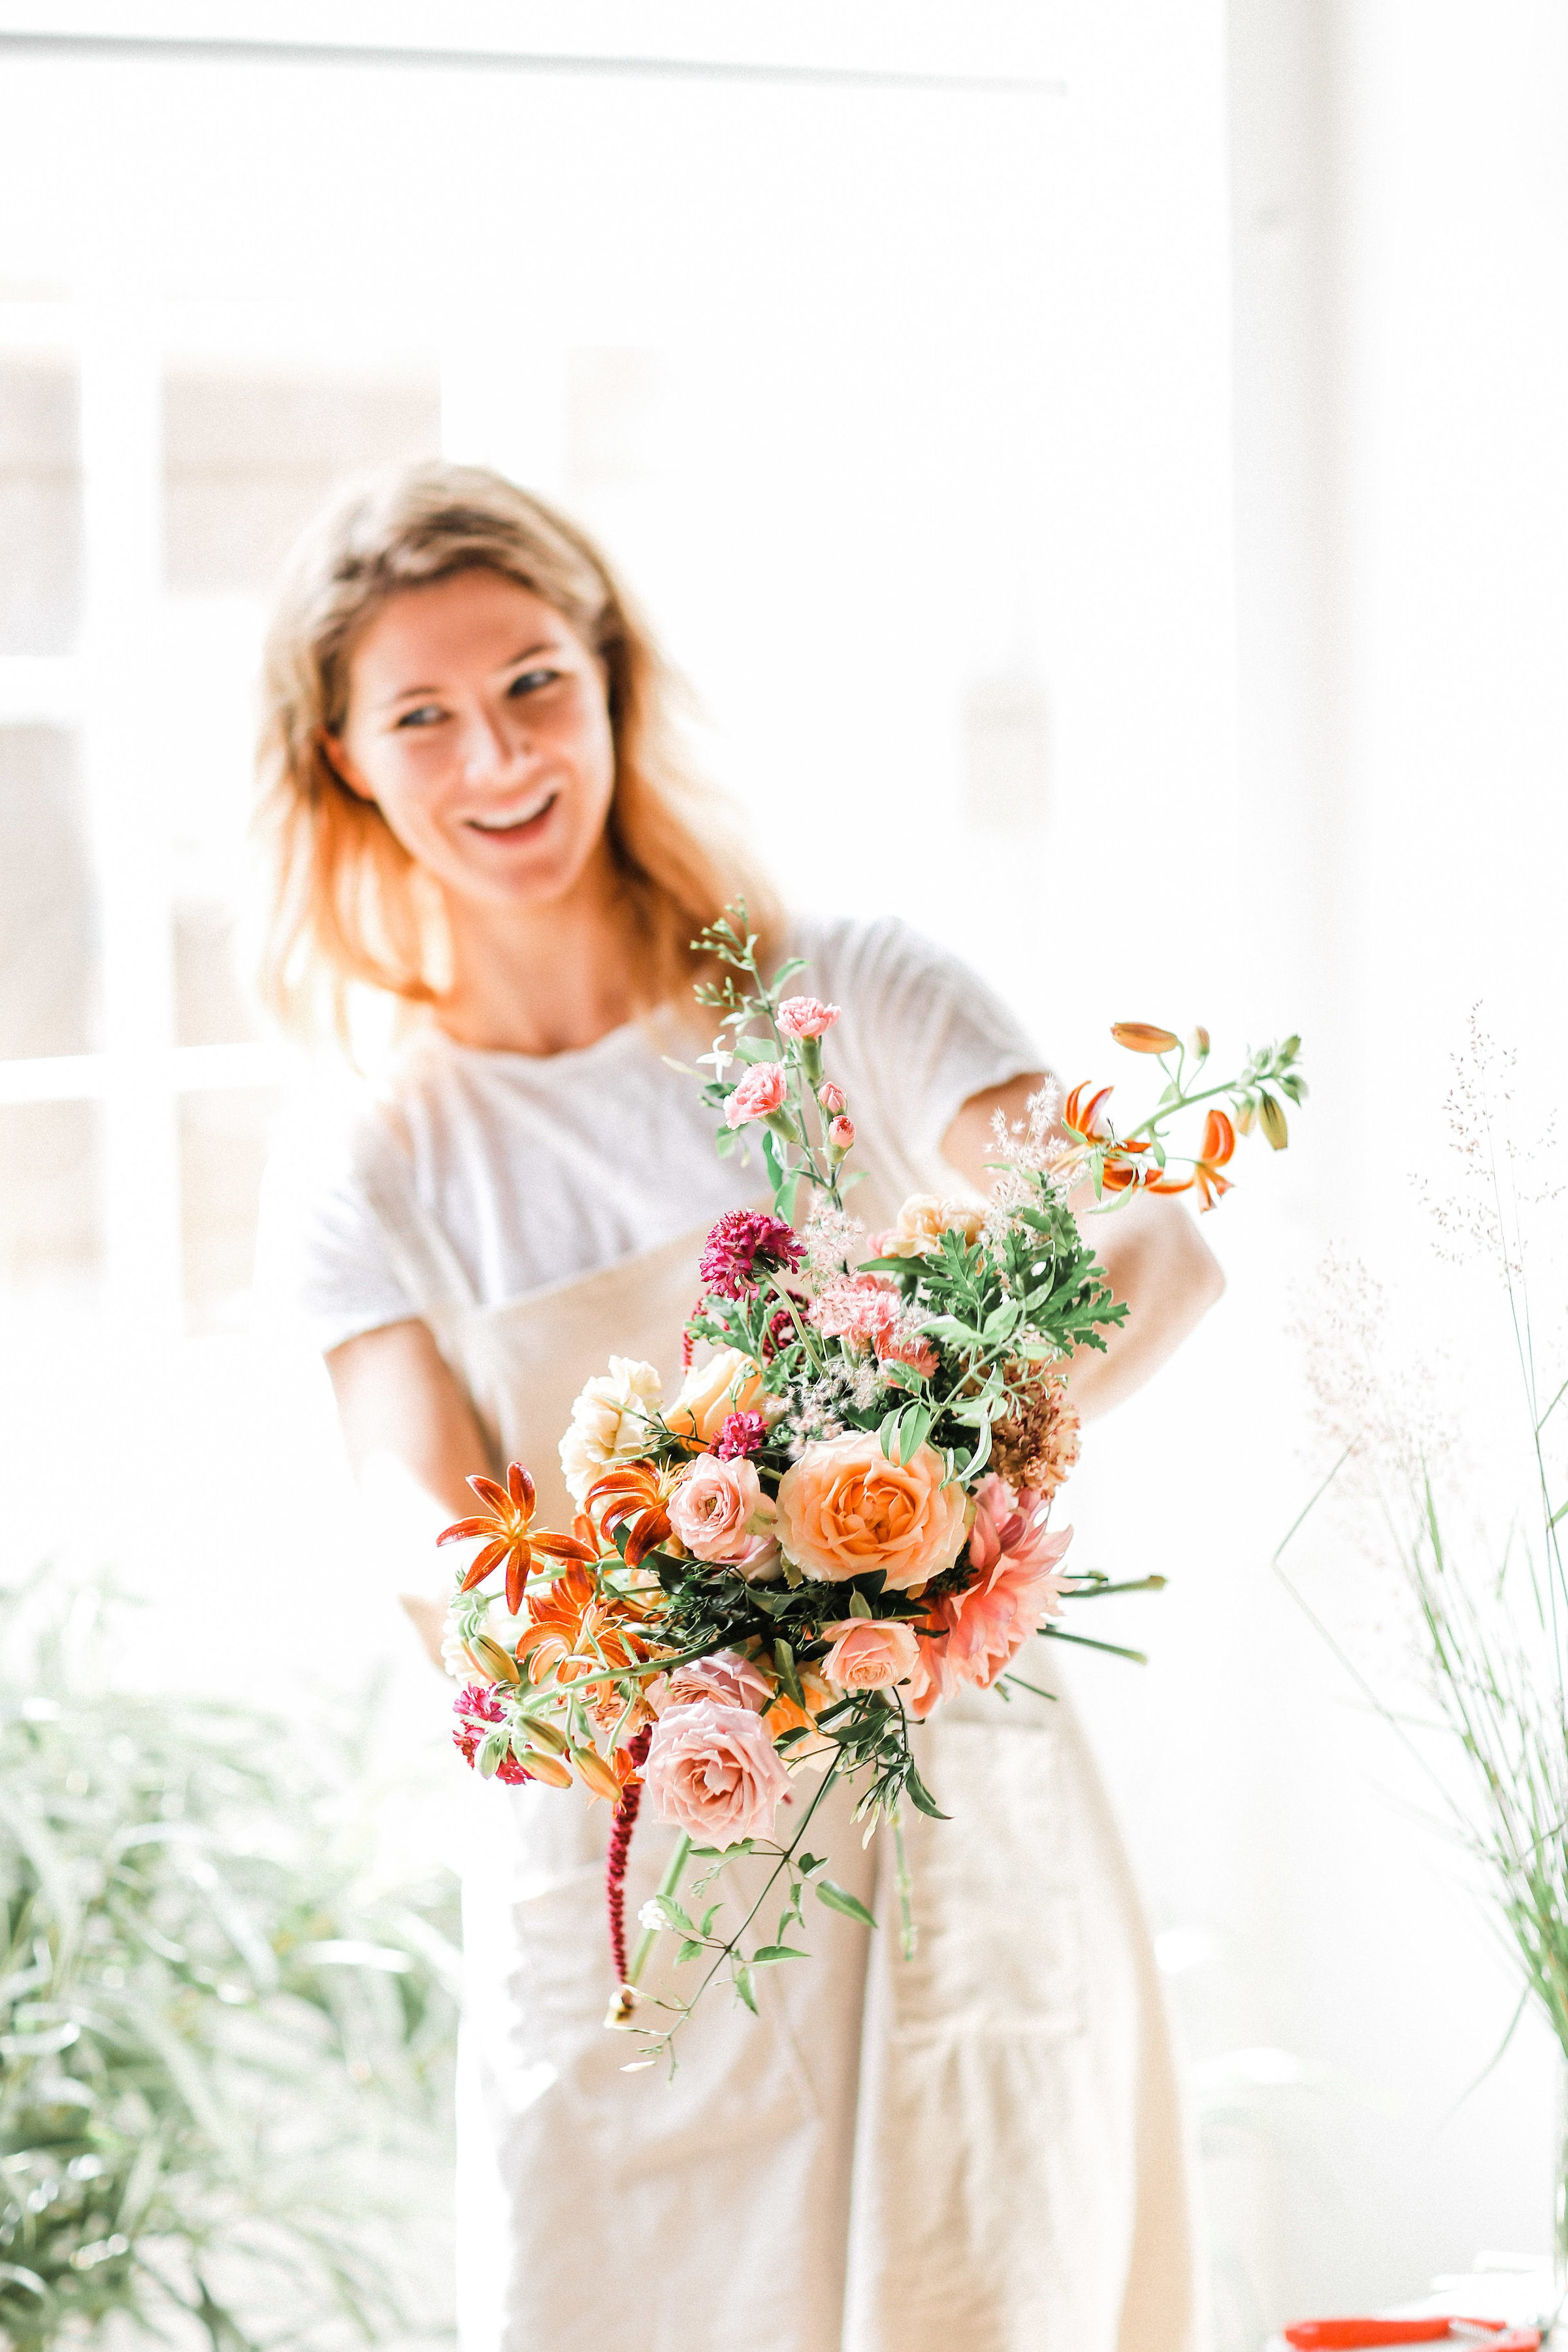 Tanya of Oh Flora Studio _ Floral Design workshop _ Lana Ivanova Photo.JPG